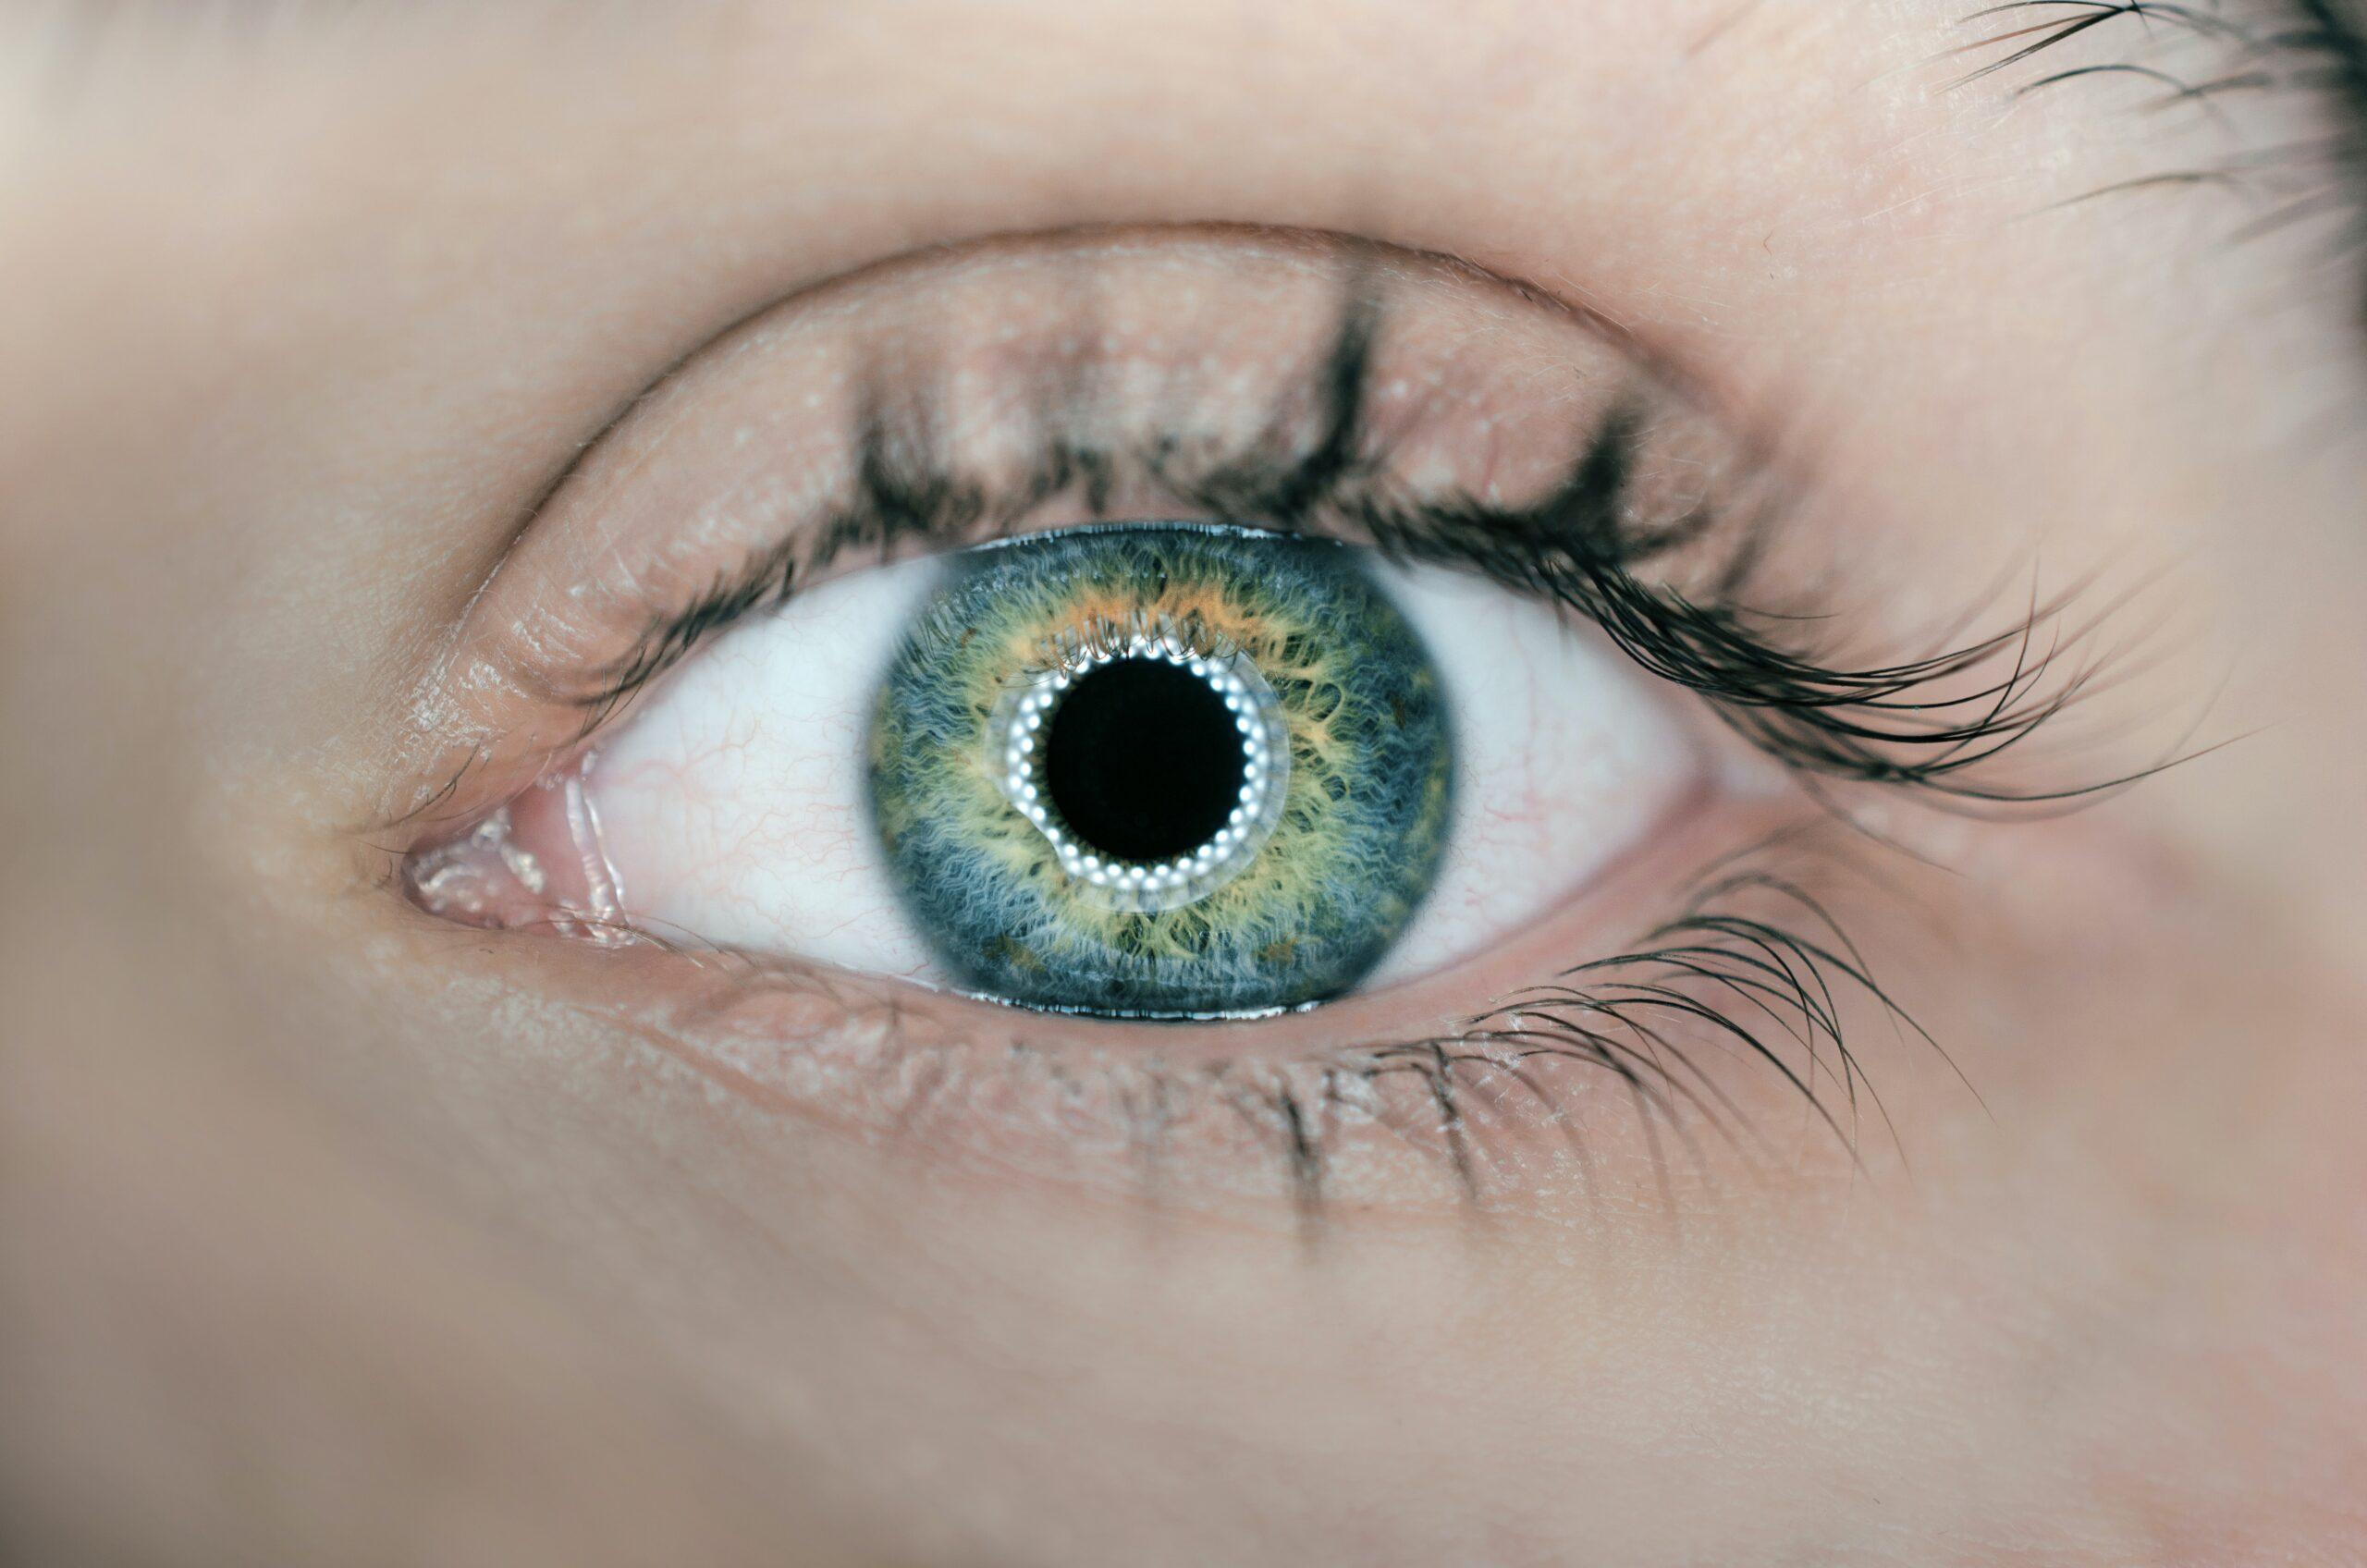 c-eye-cyber-oko